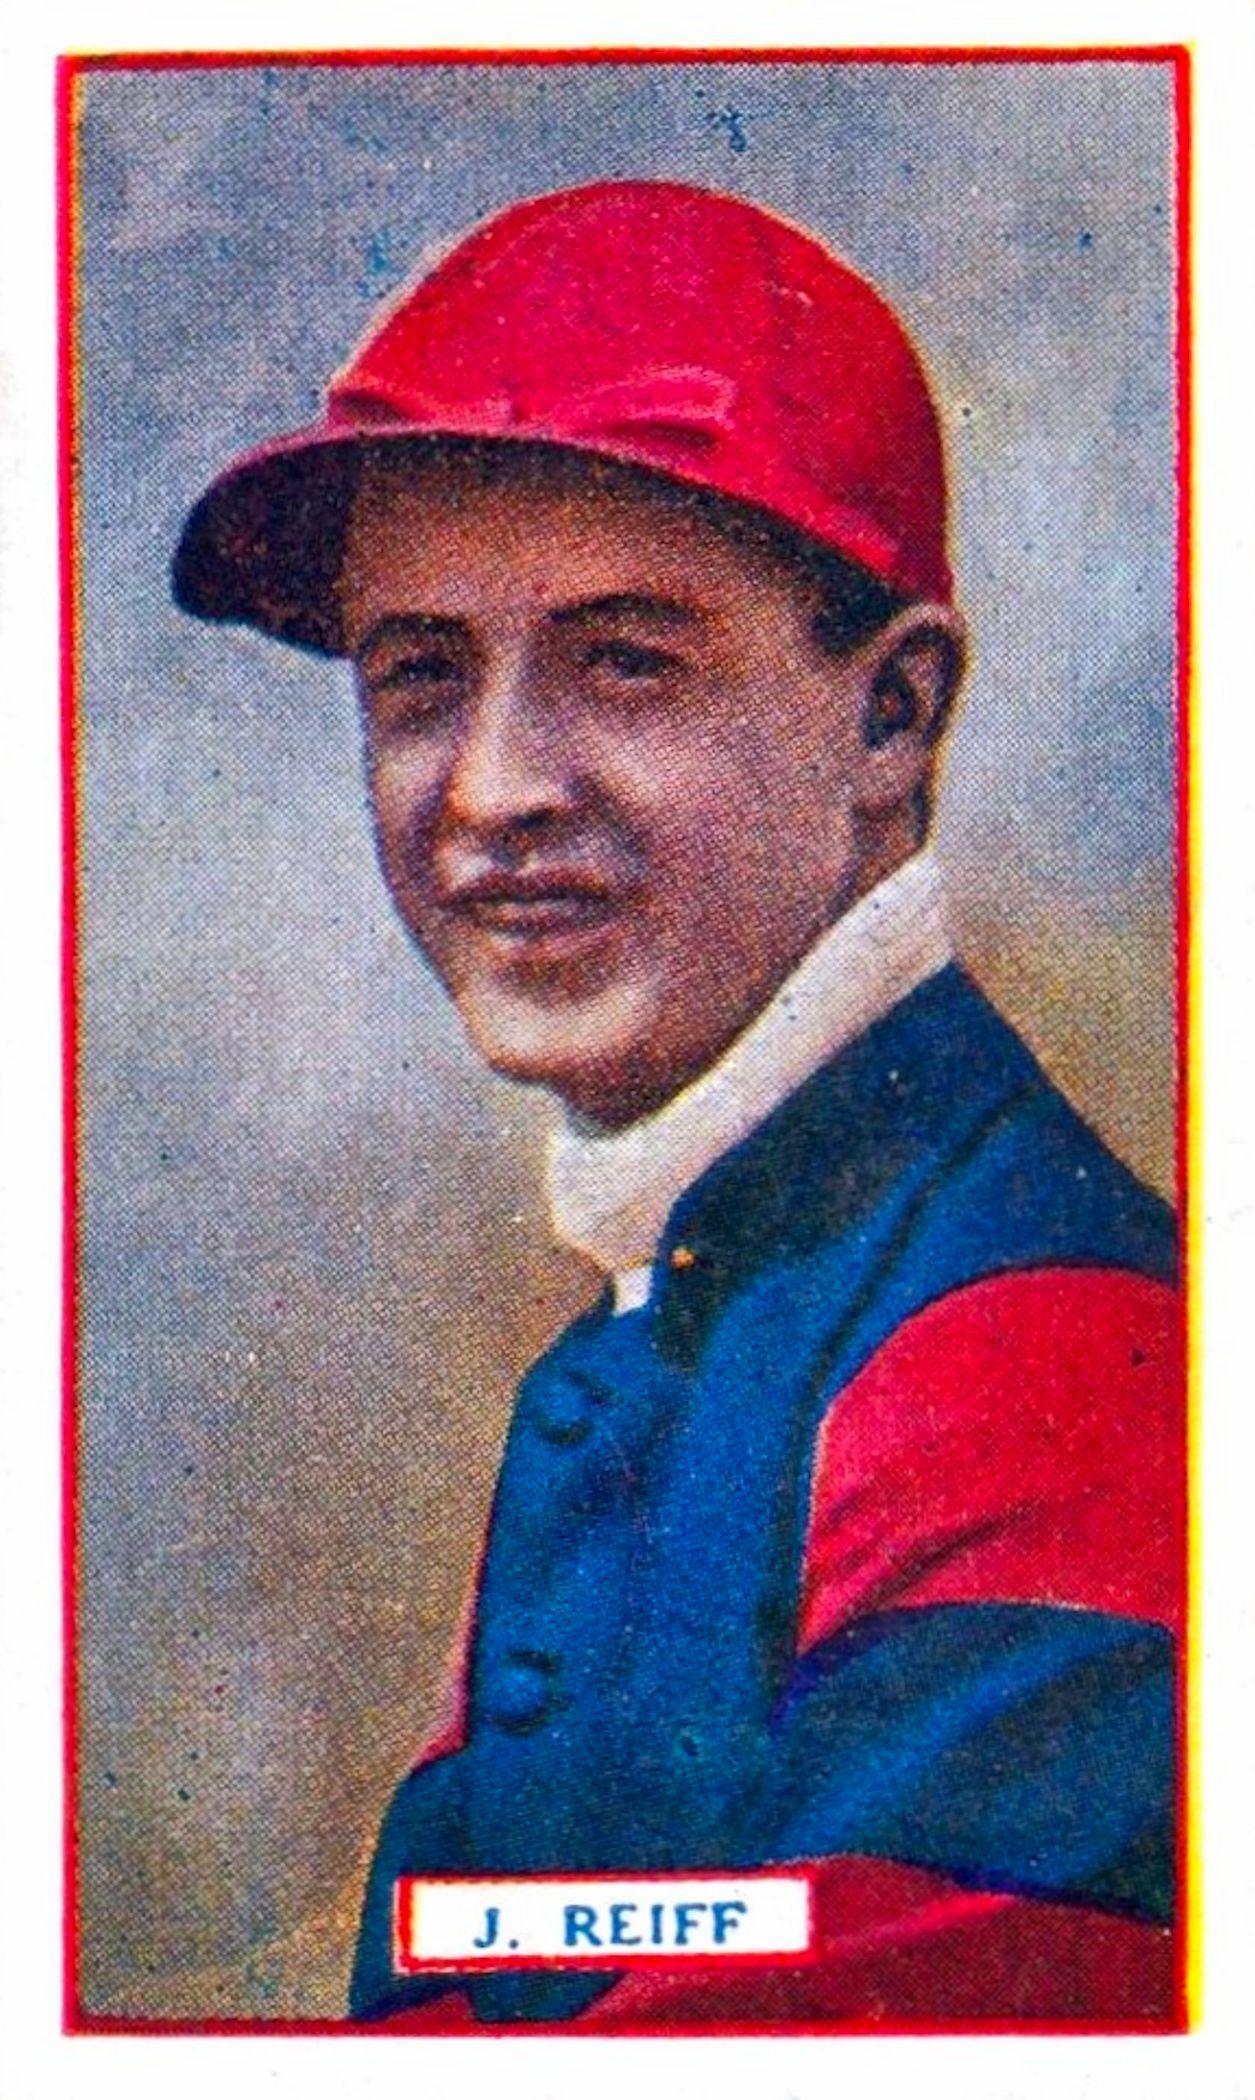 John Reiff, Godfrey Phillips jockey card